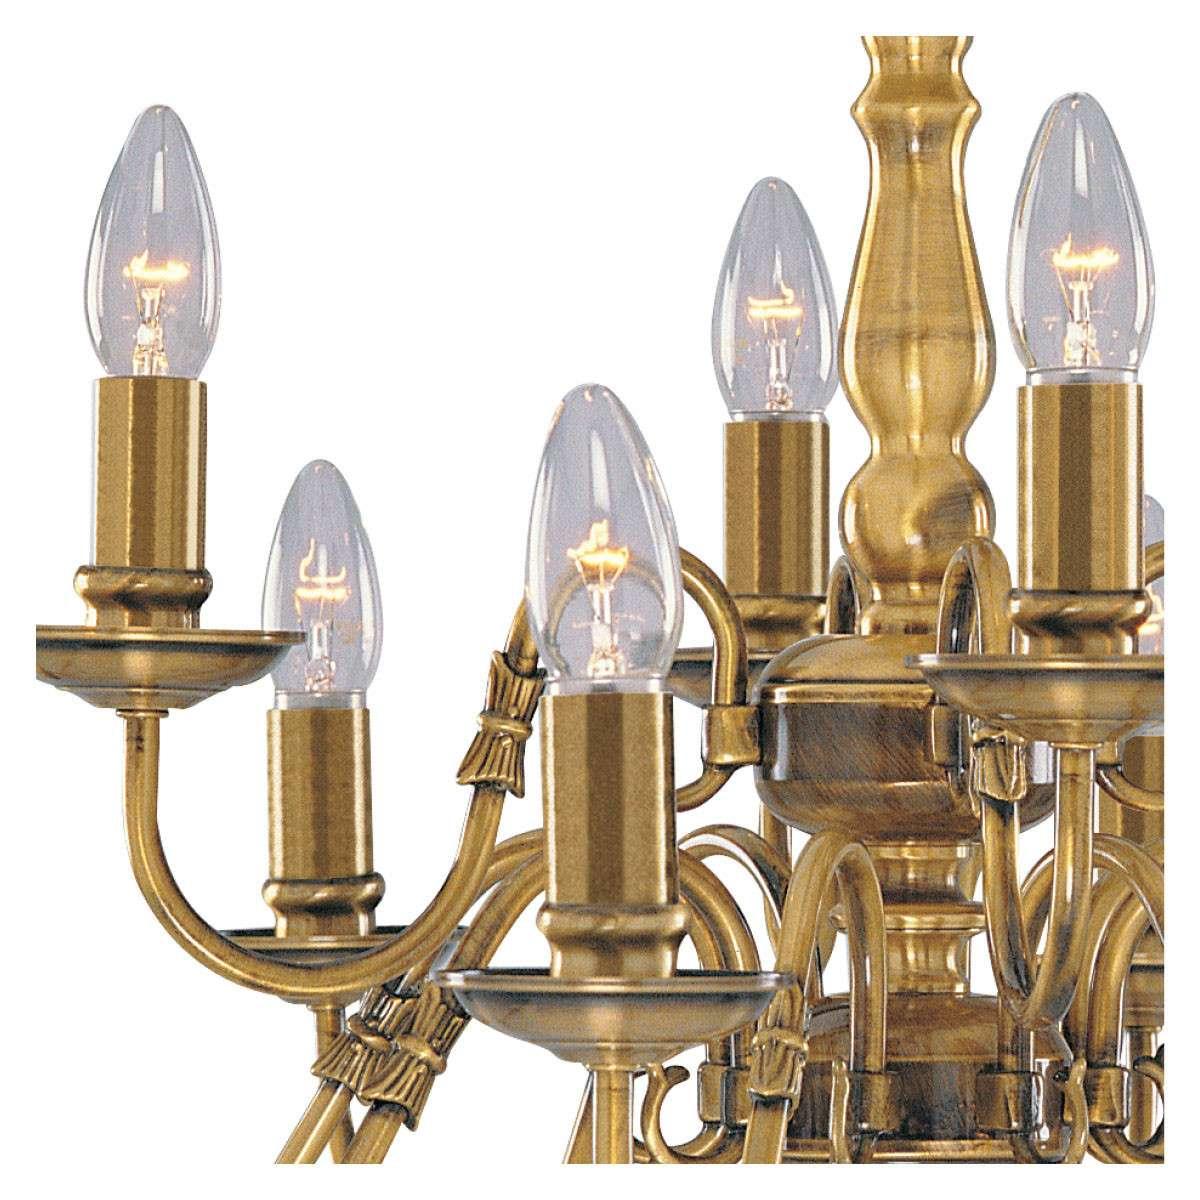 Flemish Solid Antique Brass 12 Light Chandelier